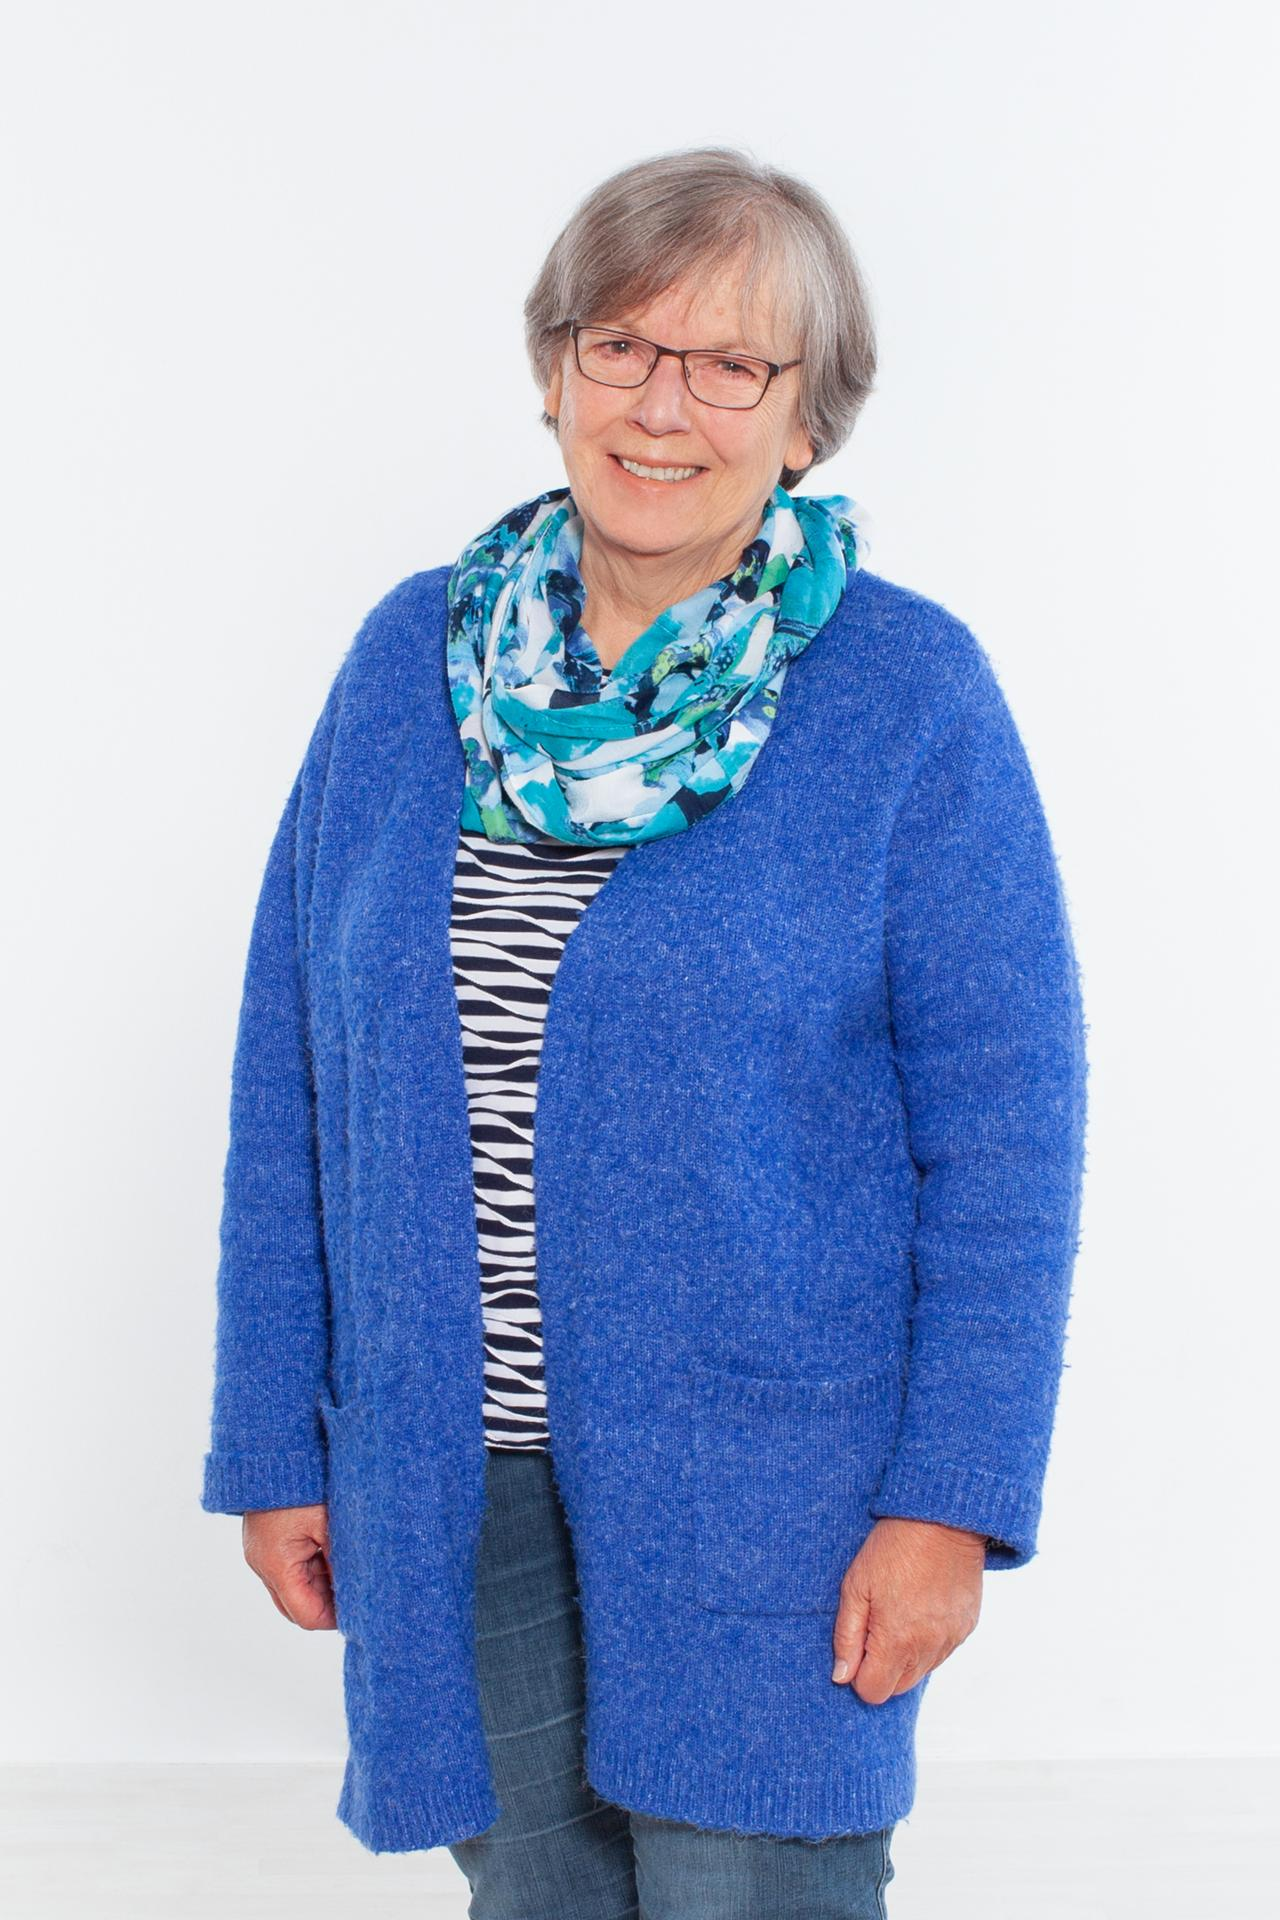 Marie-Luise Weber